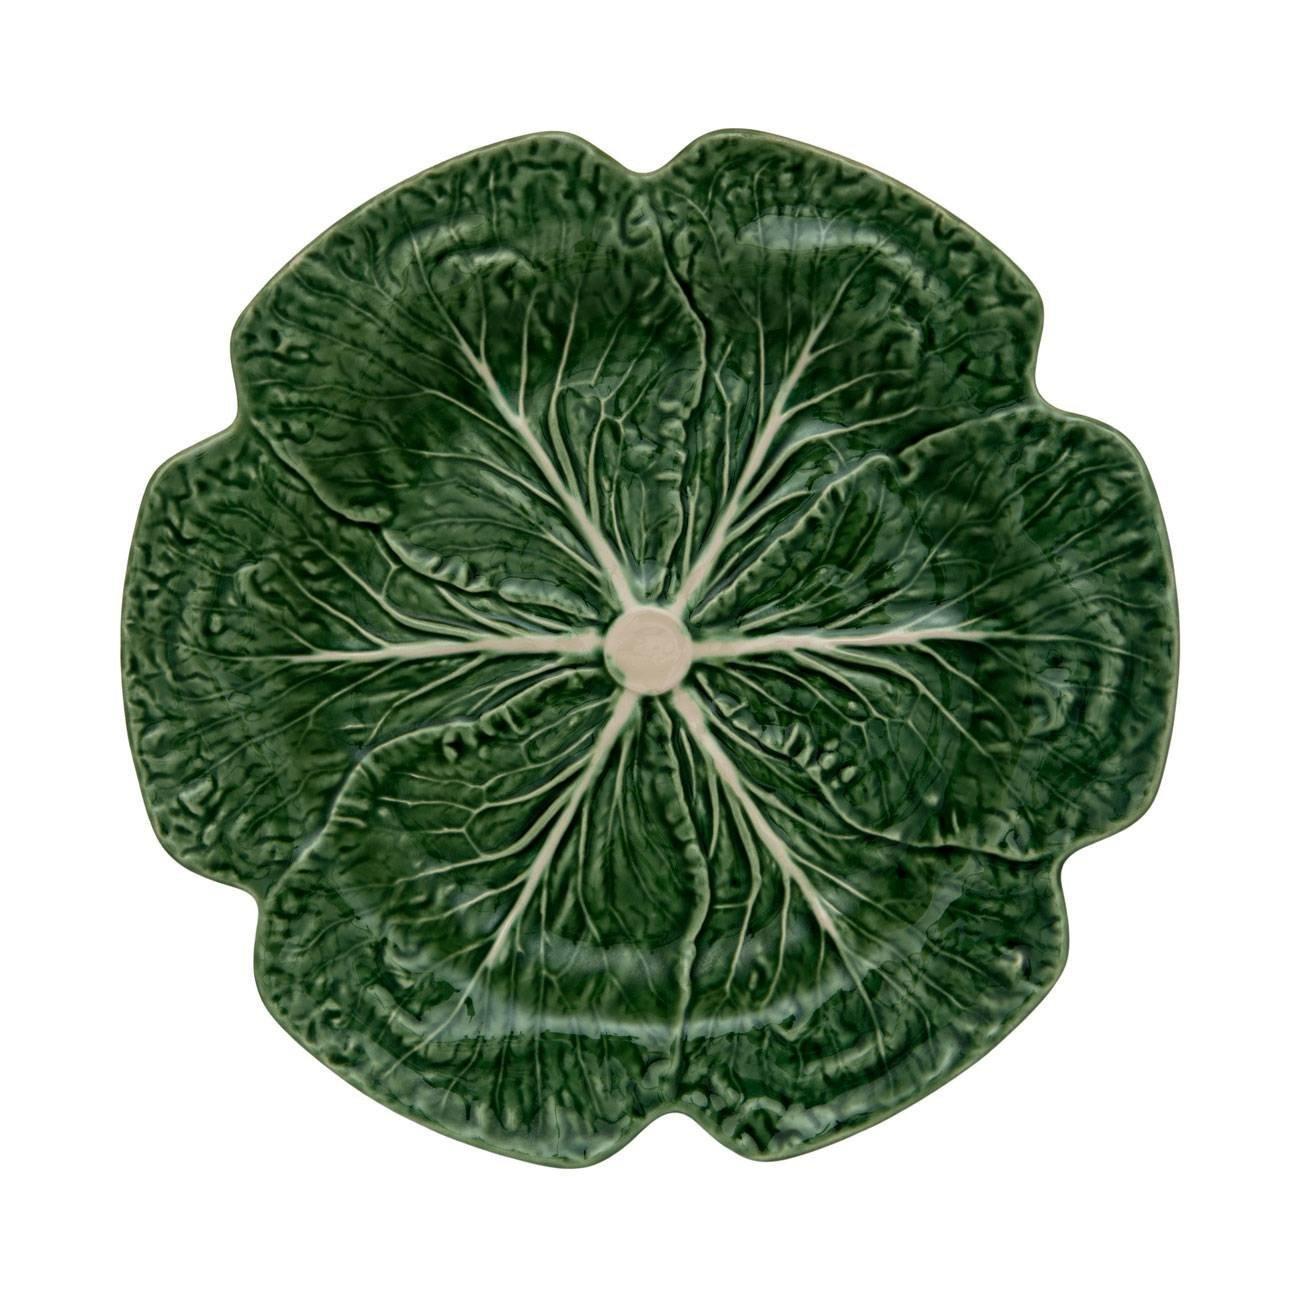 Bordallo Pinheiro Cabbage Green Charger Plate, Set of 2